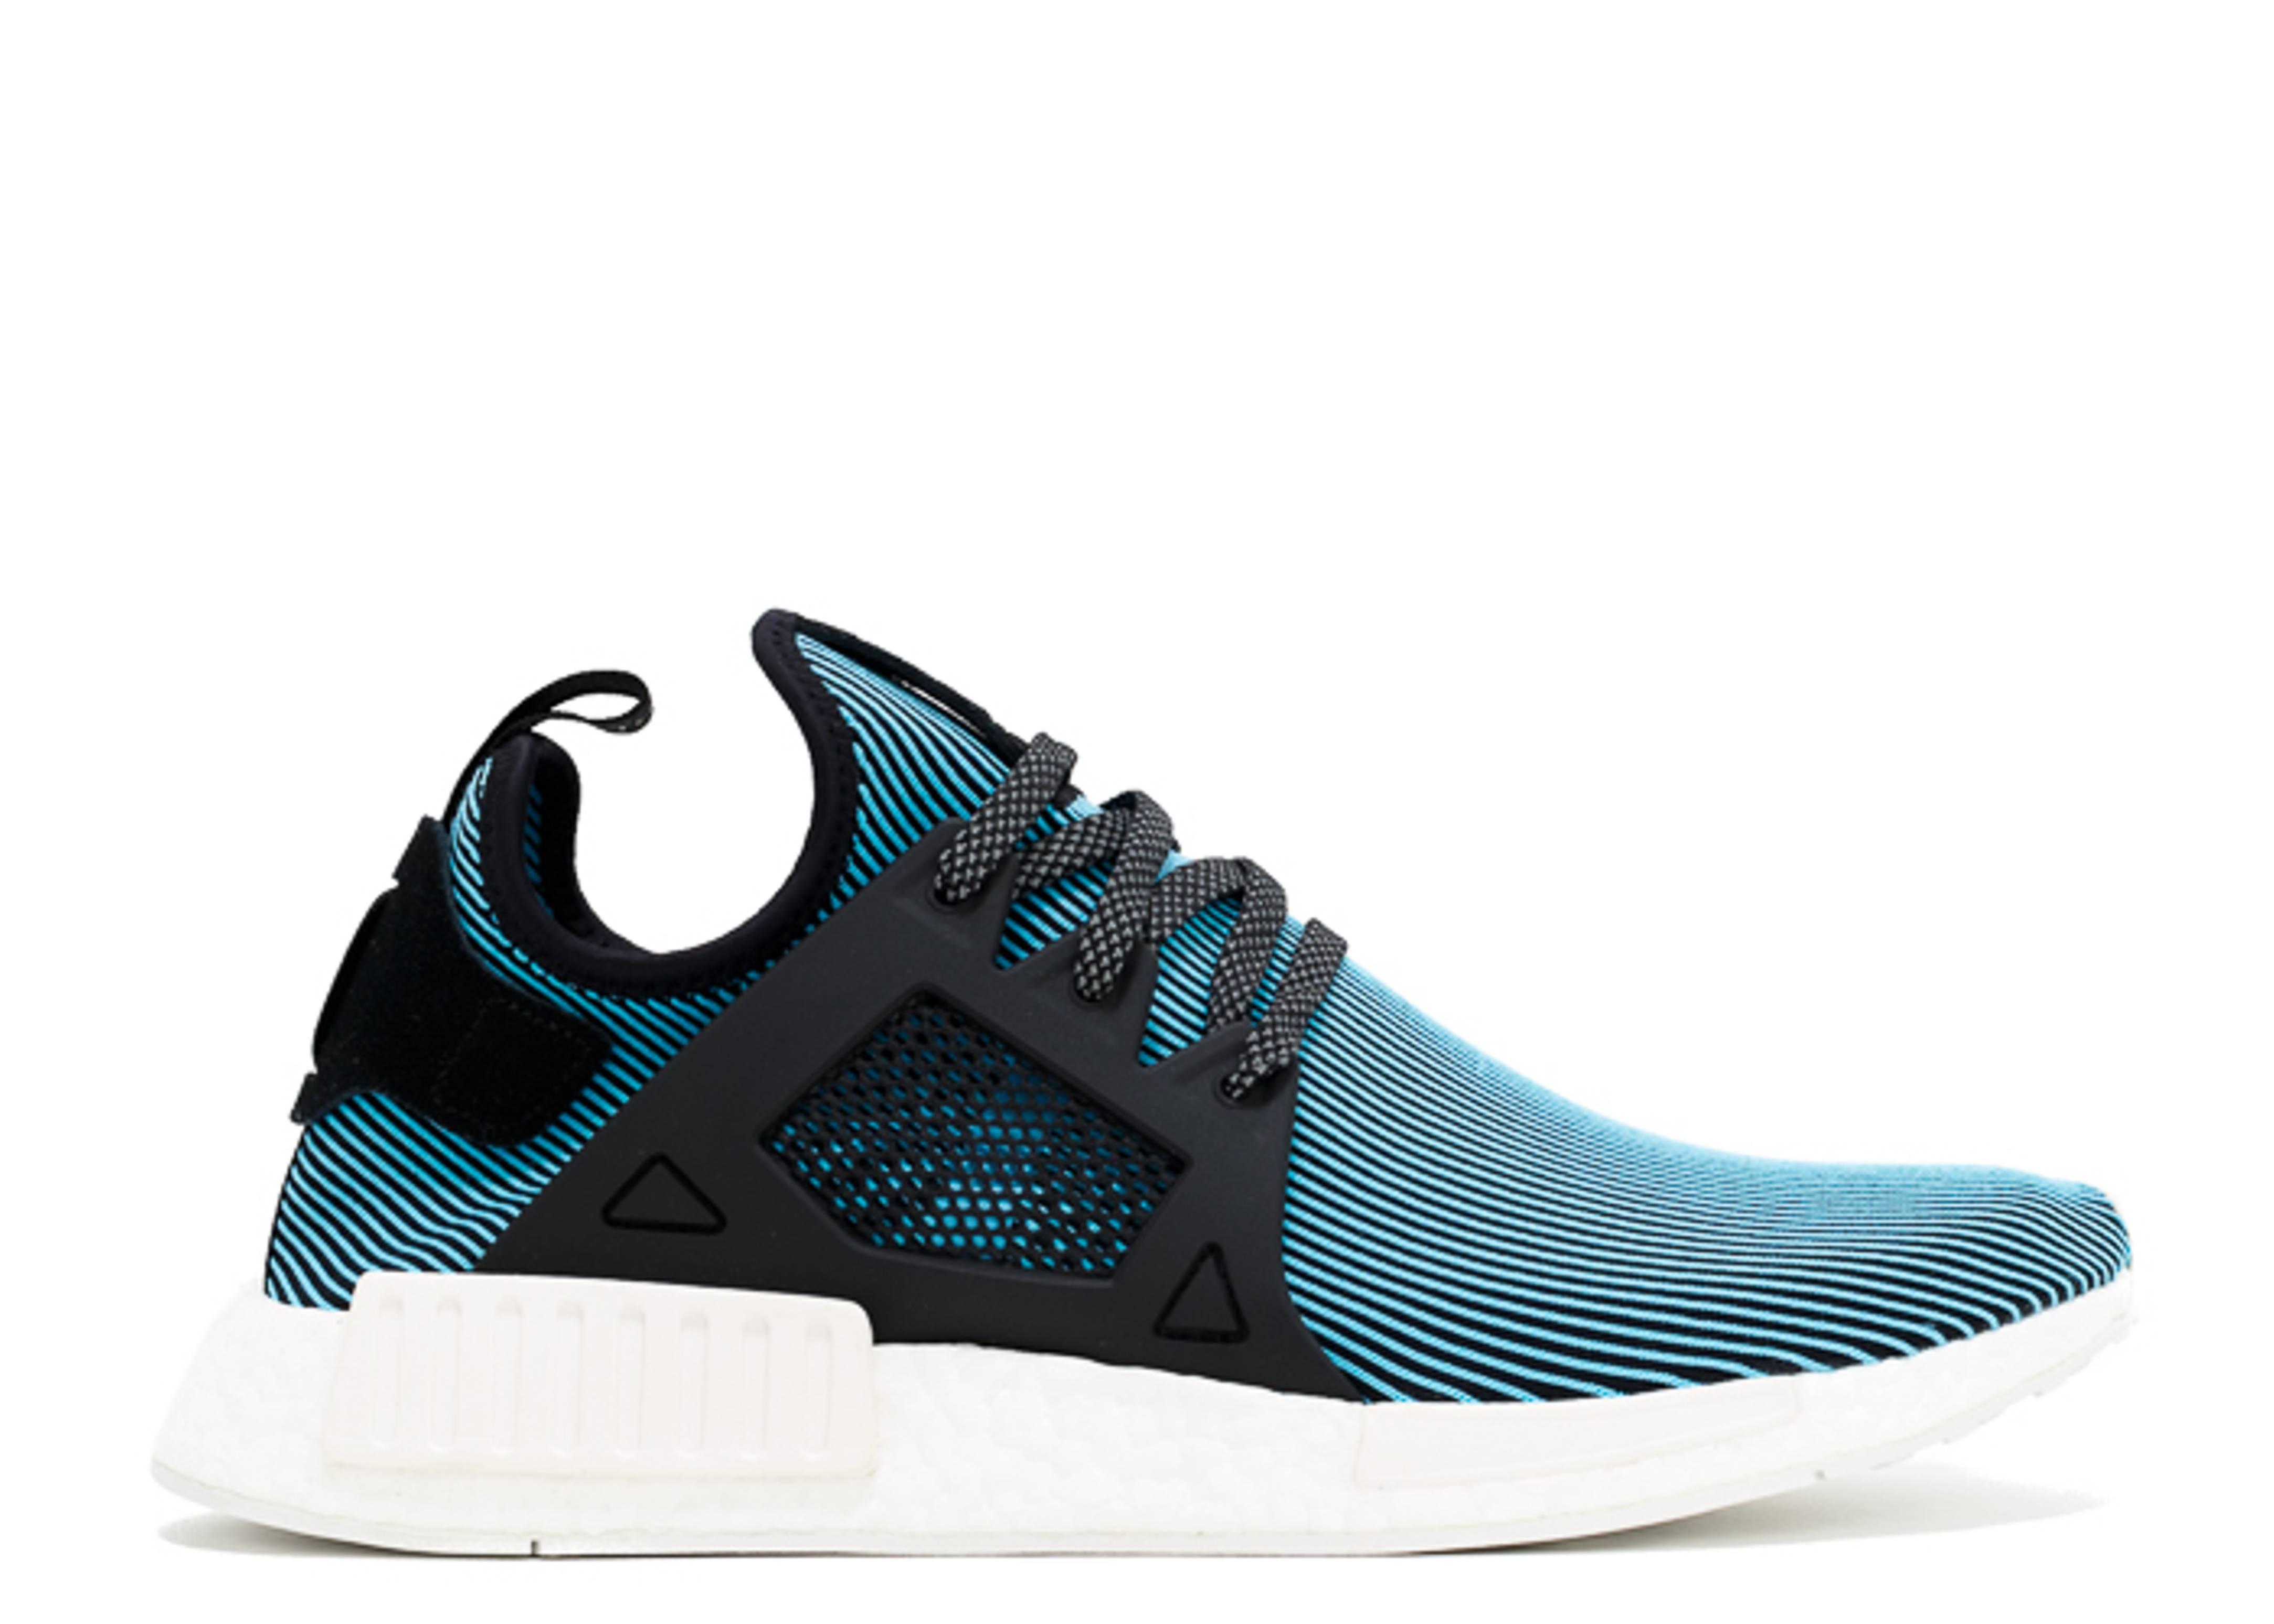 adidas Men Shoes / Sneakers NMD XR1 Primeknit.uk